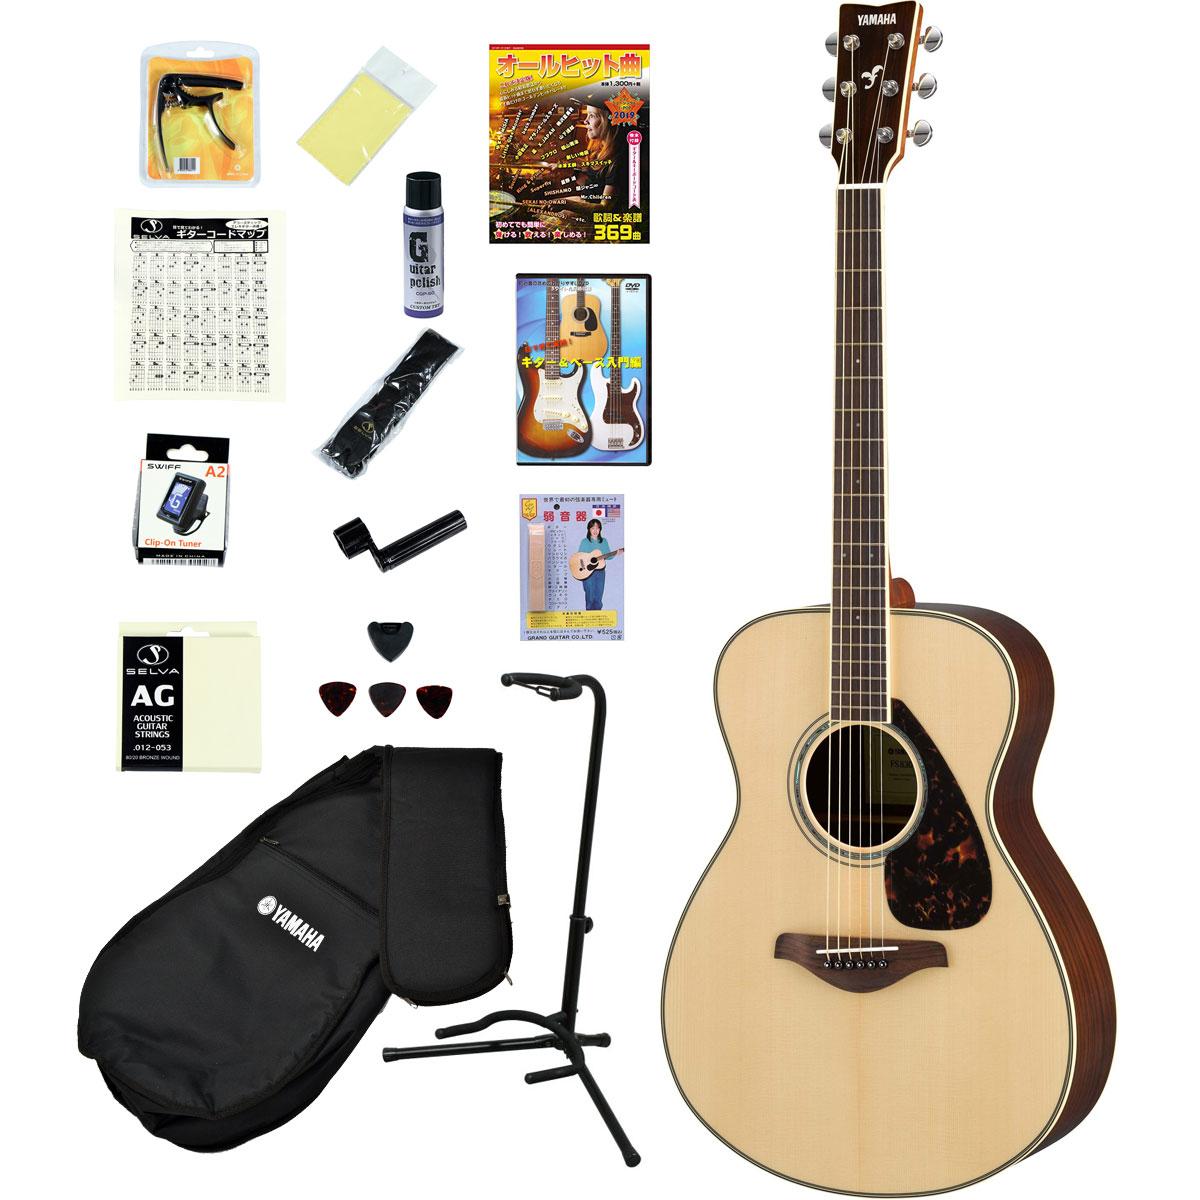 YAMAHA / FS830 NT(ナチュラル) 【オールヒット曲歌本17点入門セット】【楽譜が付いたお買い得セット】 ヤマハ アコースティックギター アコギ FS-830 入門 初心者【YRK】